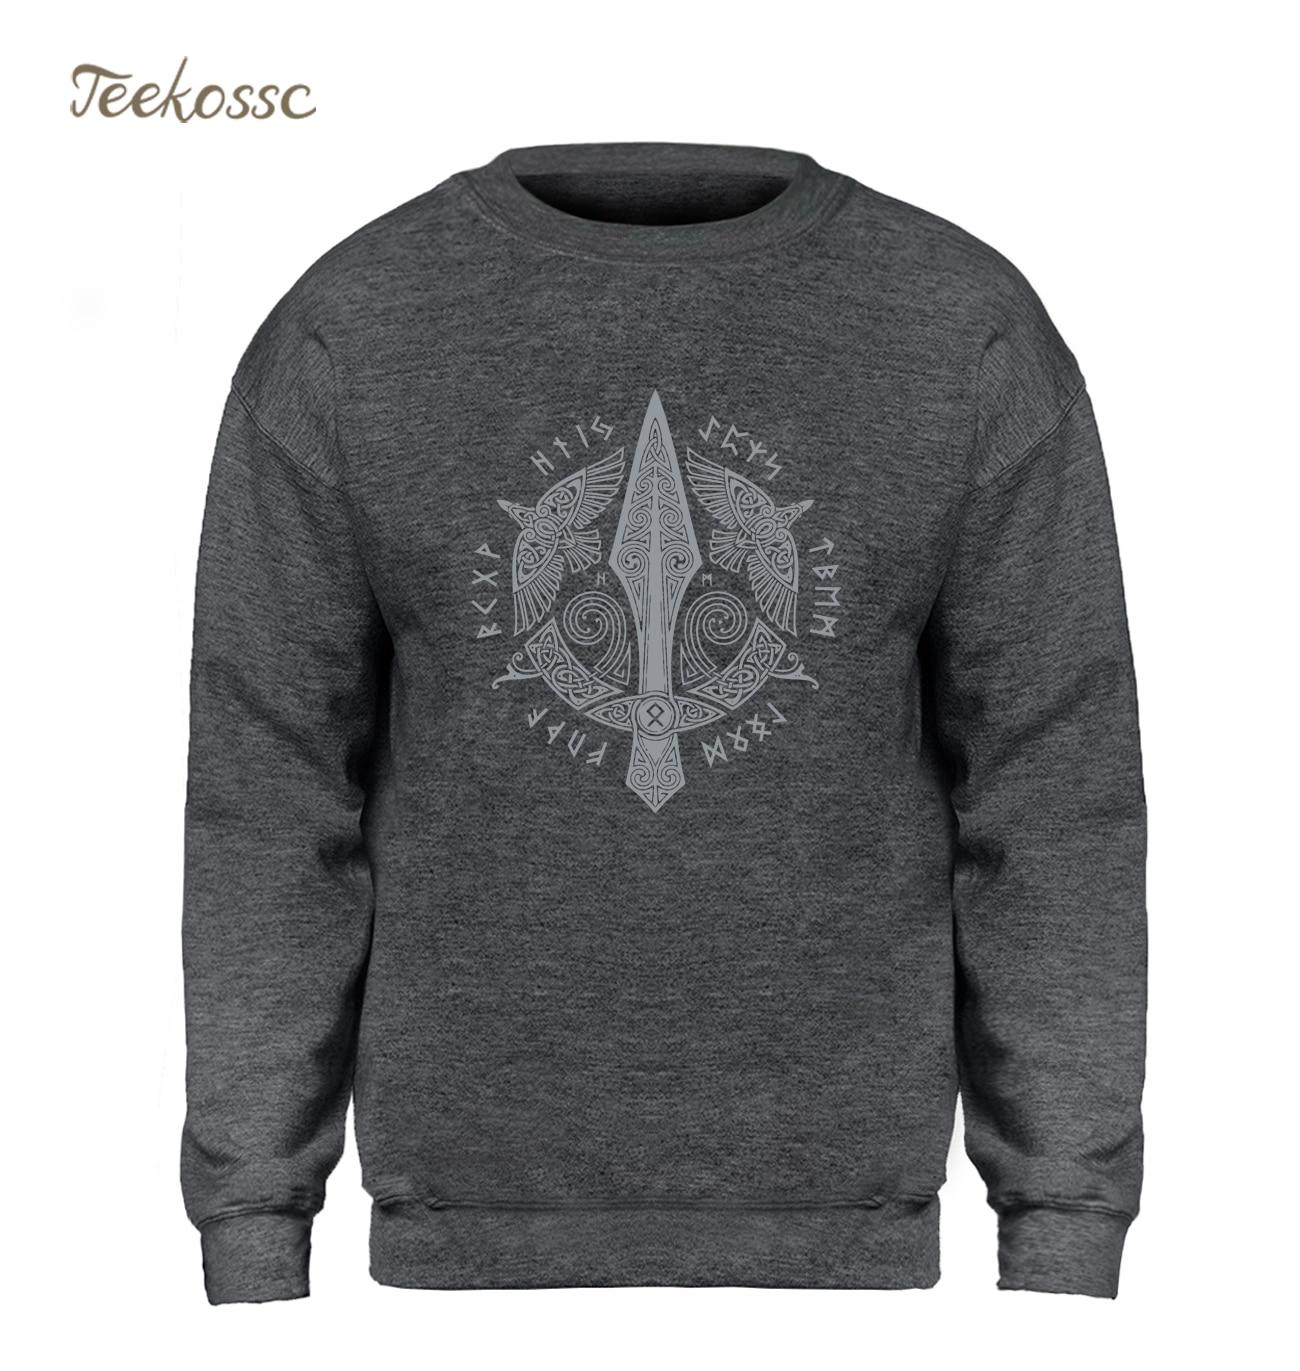 Odin Vikings Sweatshirt Men Viking Berserker Stylish Hoodie Crewneck Sweatshirts Winter Autumn Black Streetwear Cool Loose Mens